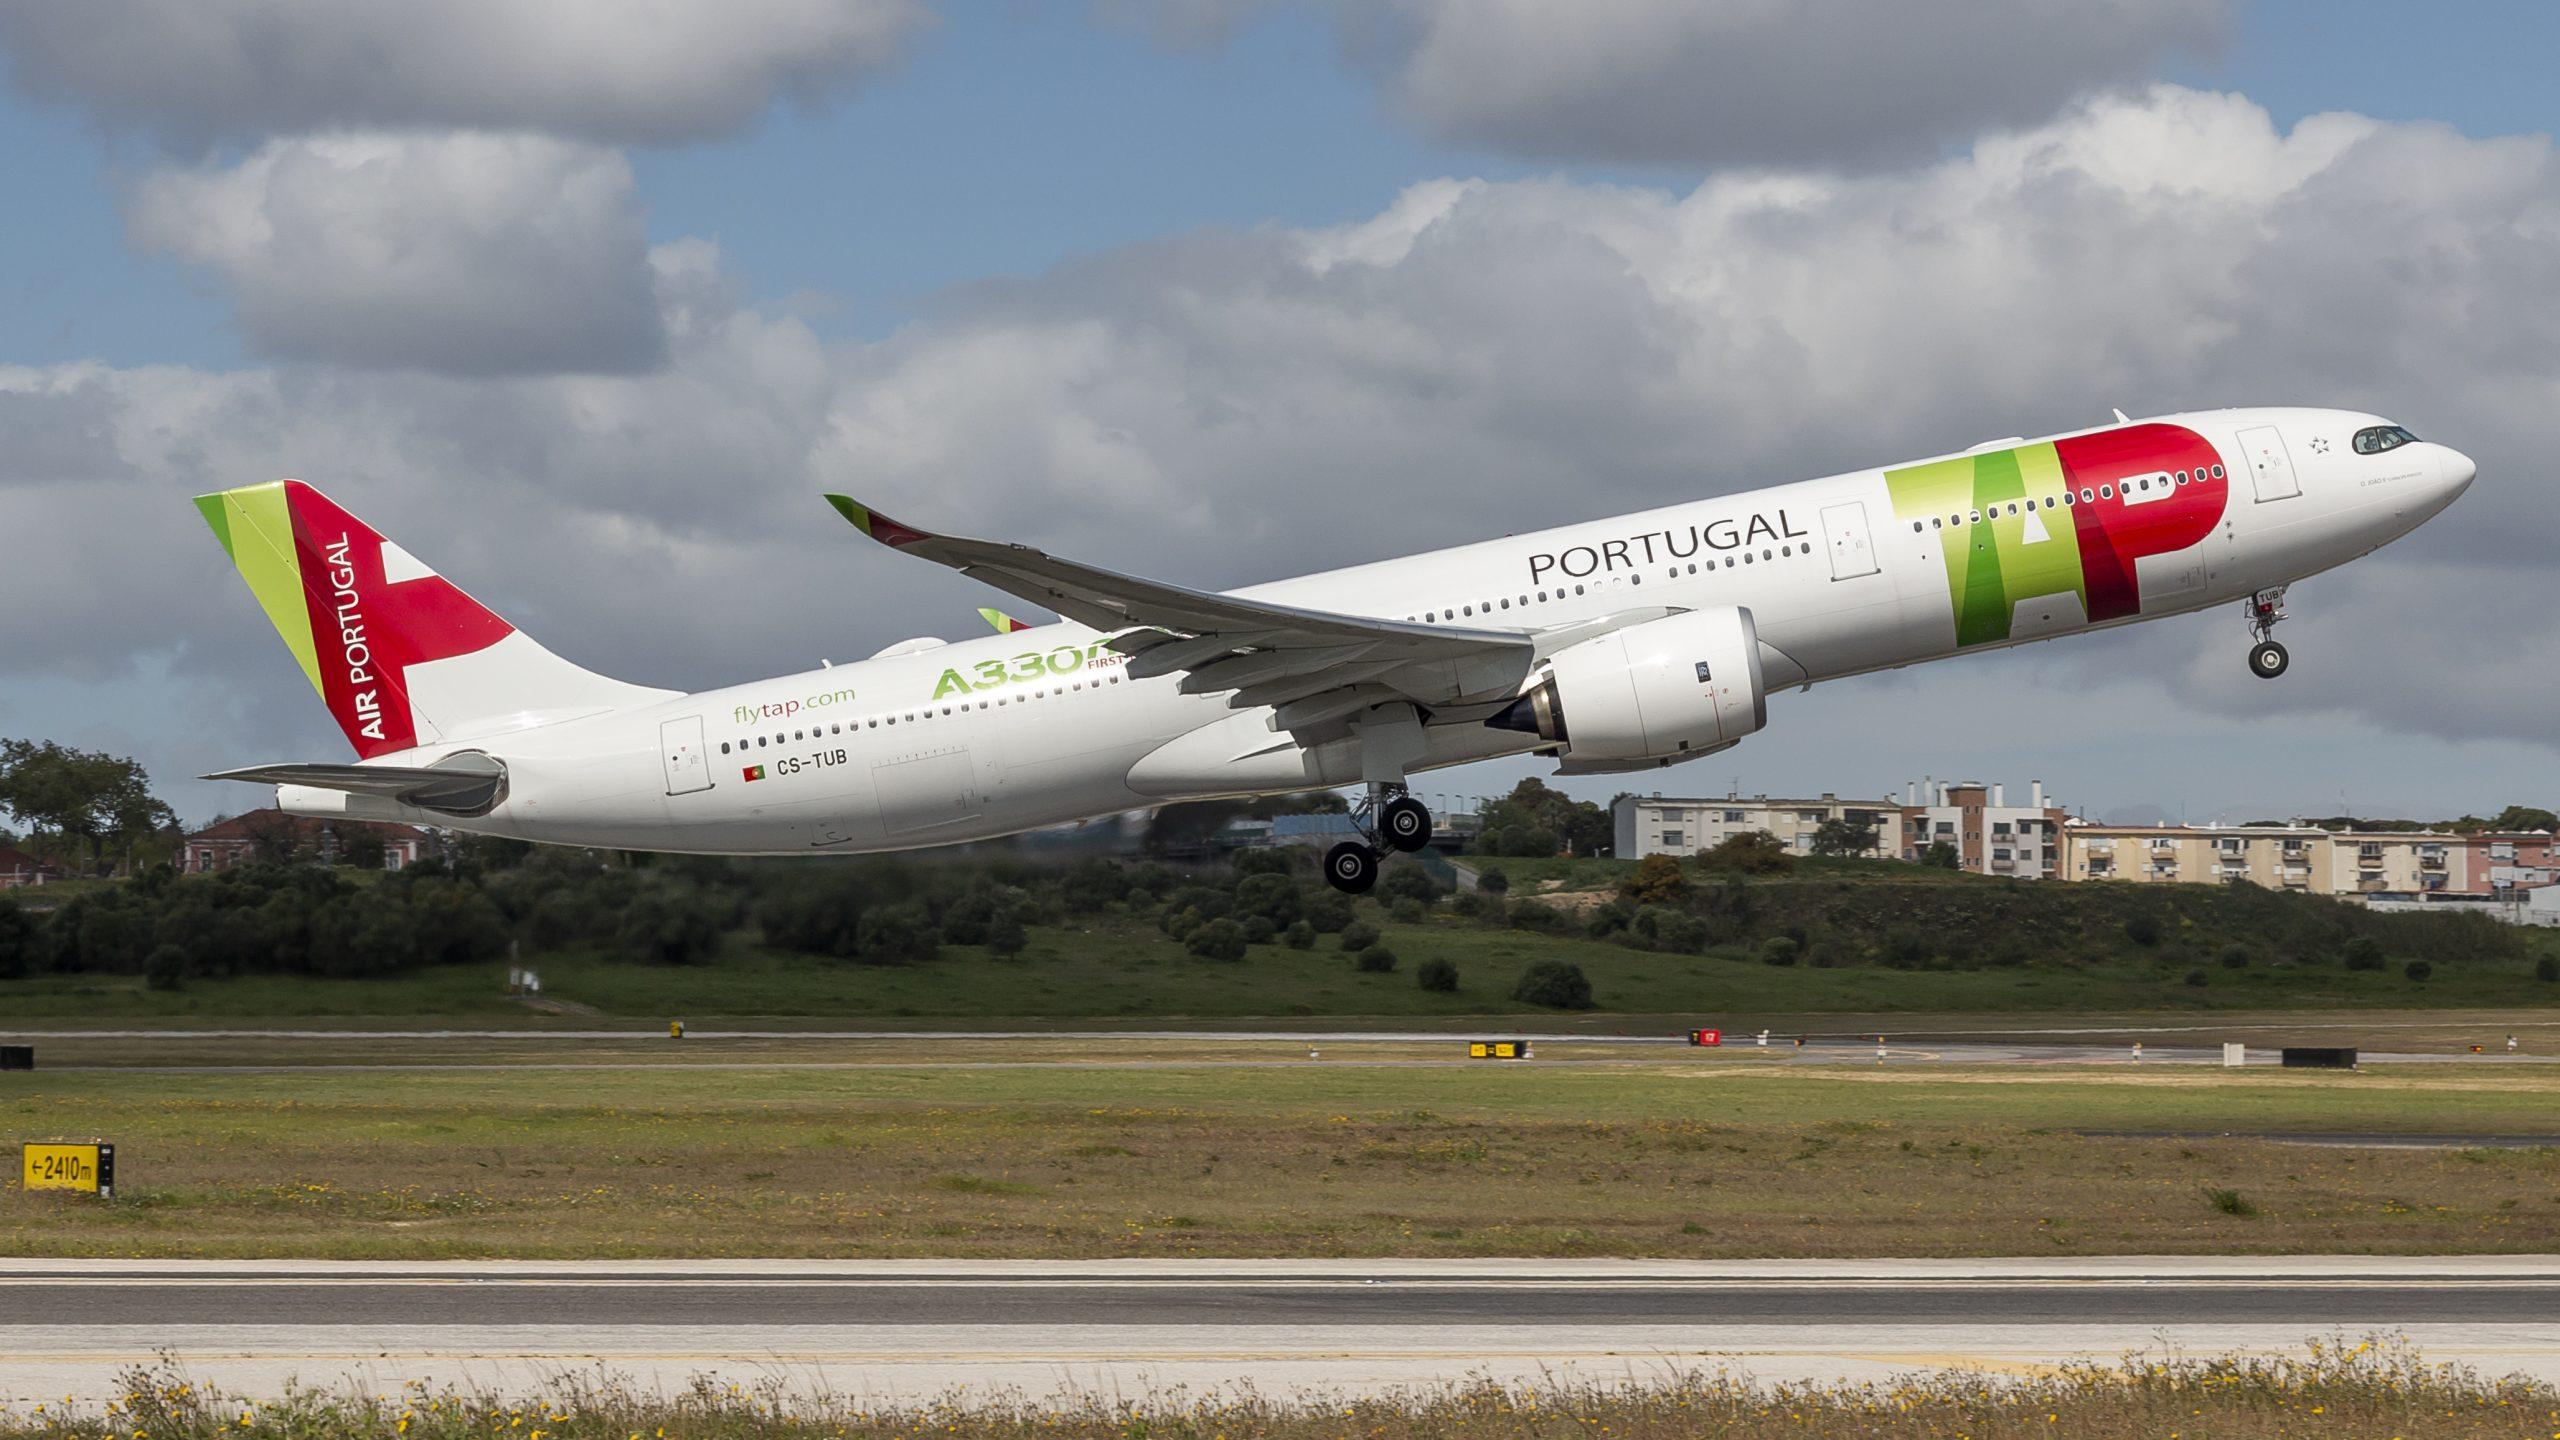 zboruri-tap-air-portugal-a330-900neo